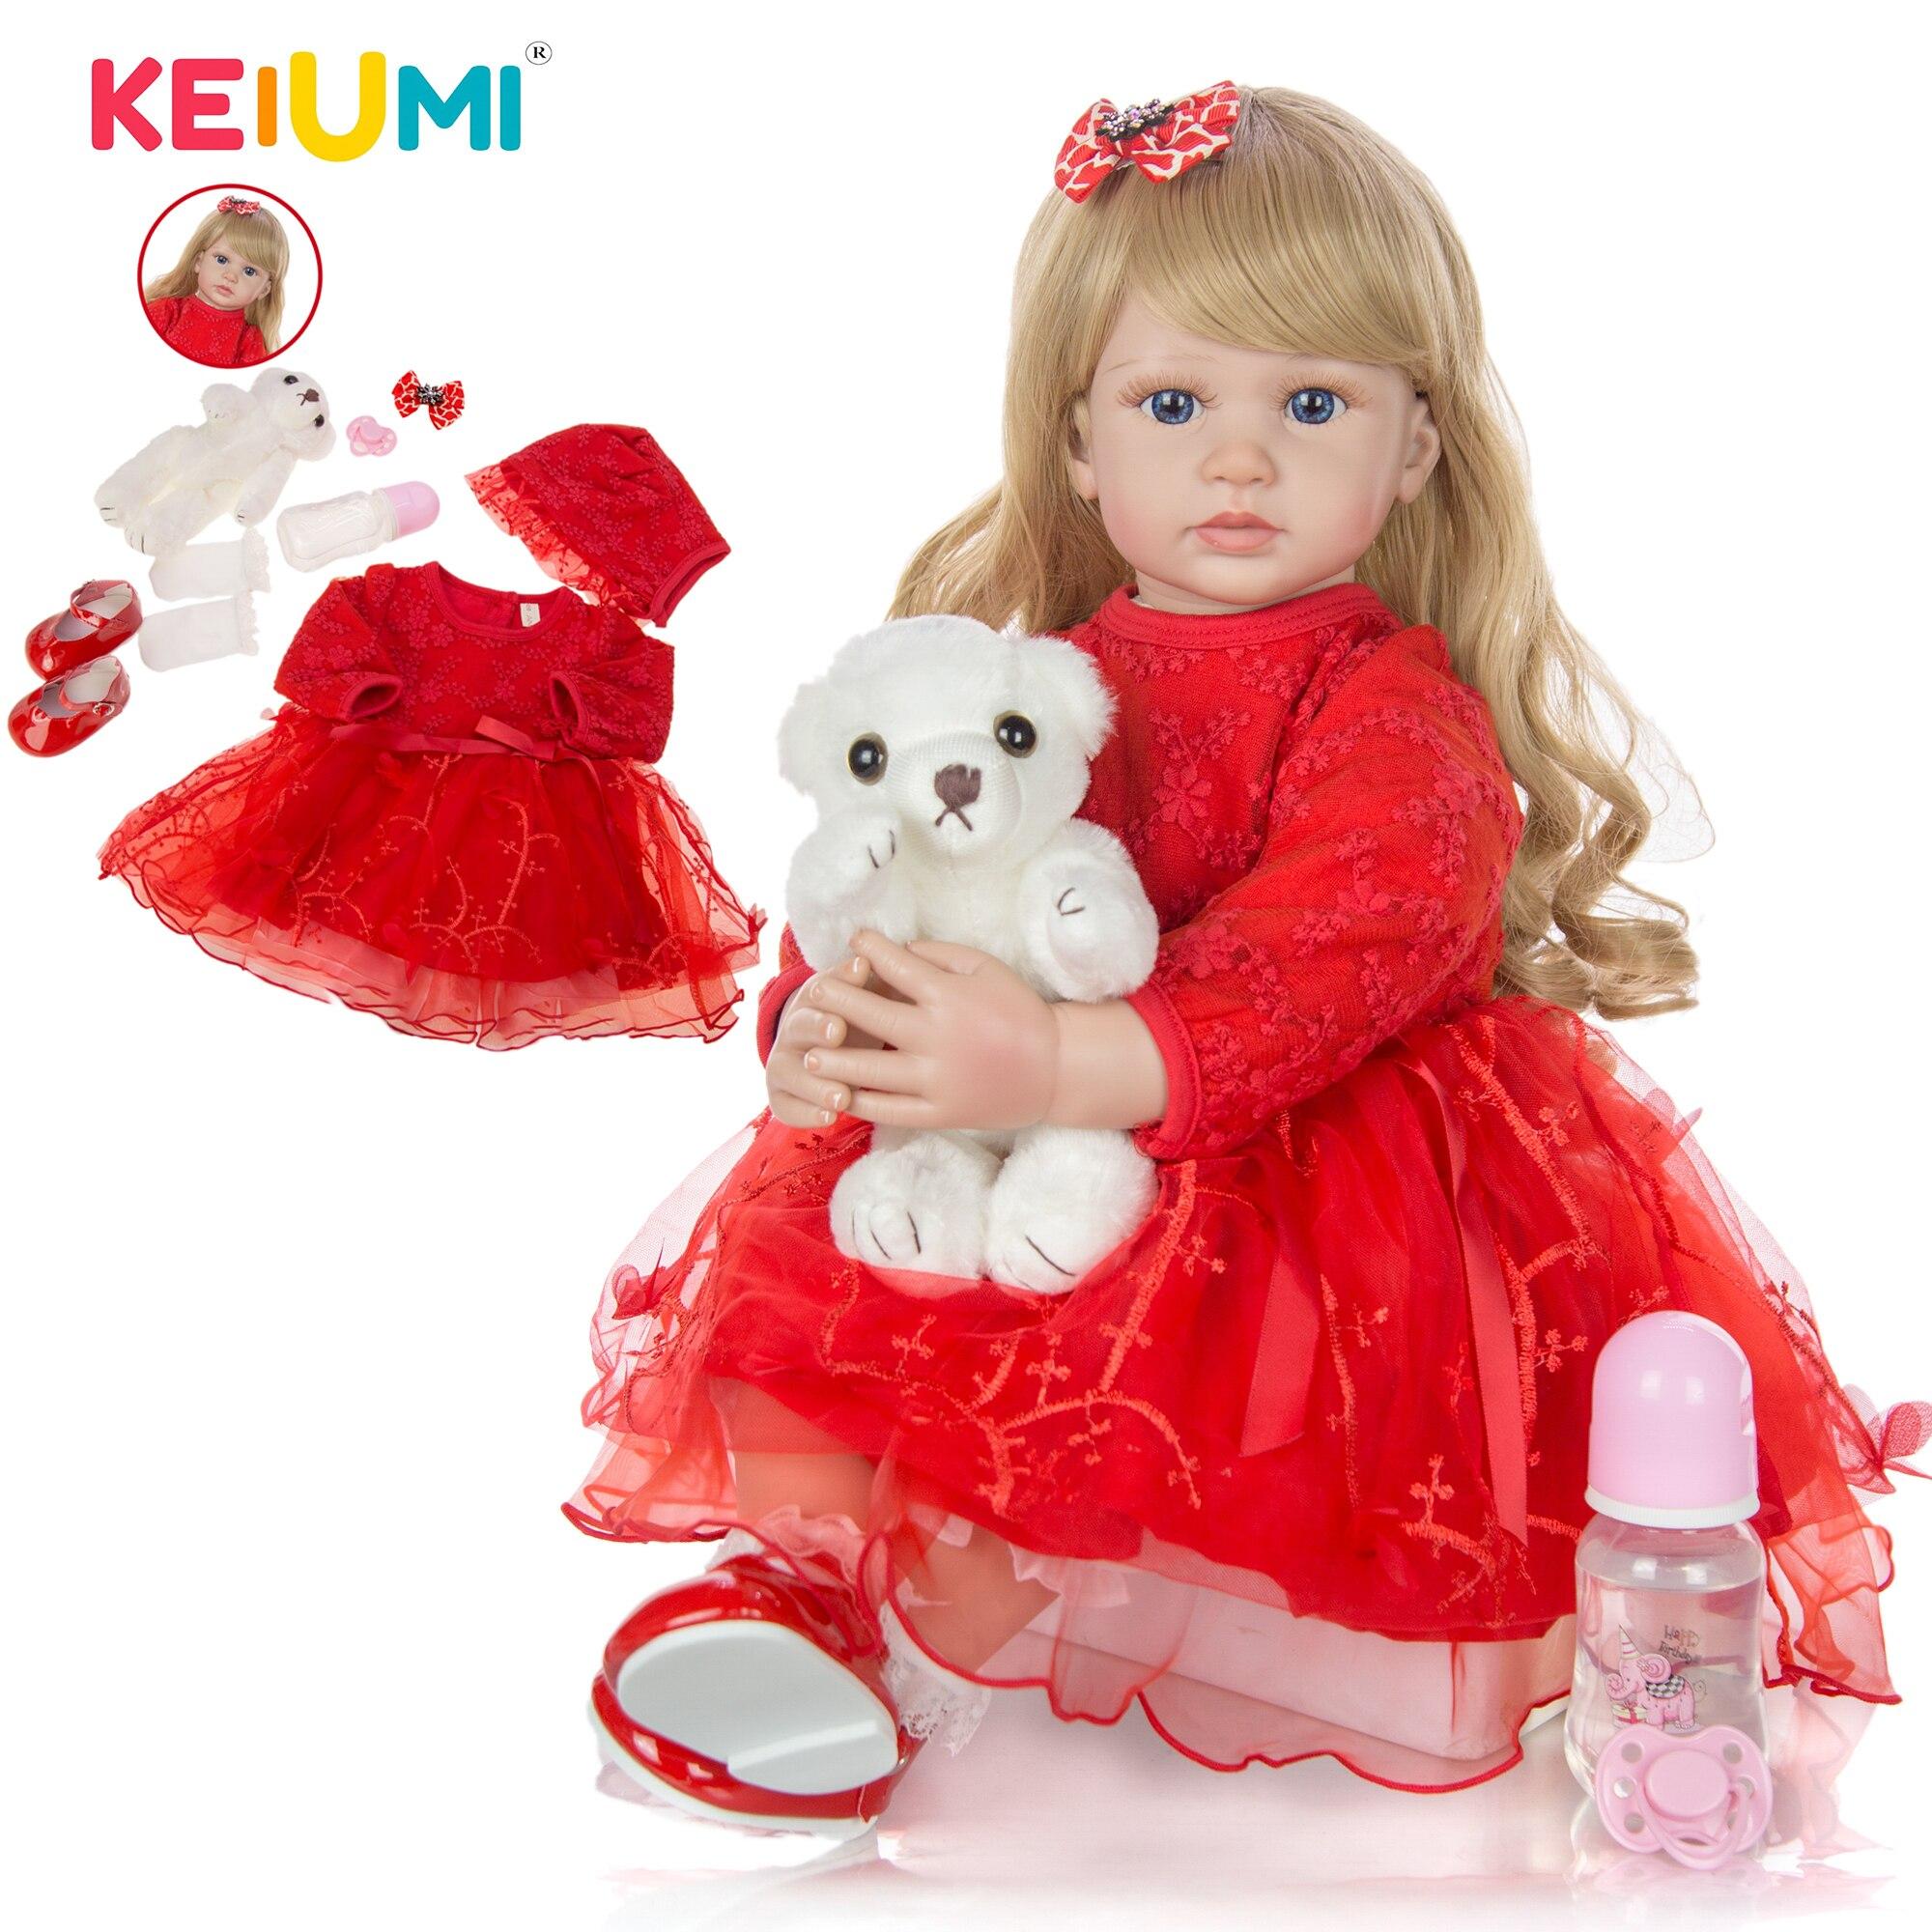 KEIUMI 24 Inch Elegant Reborn Baby Girl Doll 60 cm Soft Vinyl Cloth Body Princess Doll Lifelike Boneca Reborn Kids Playmate